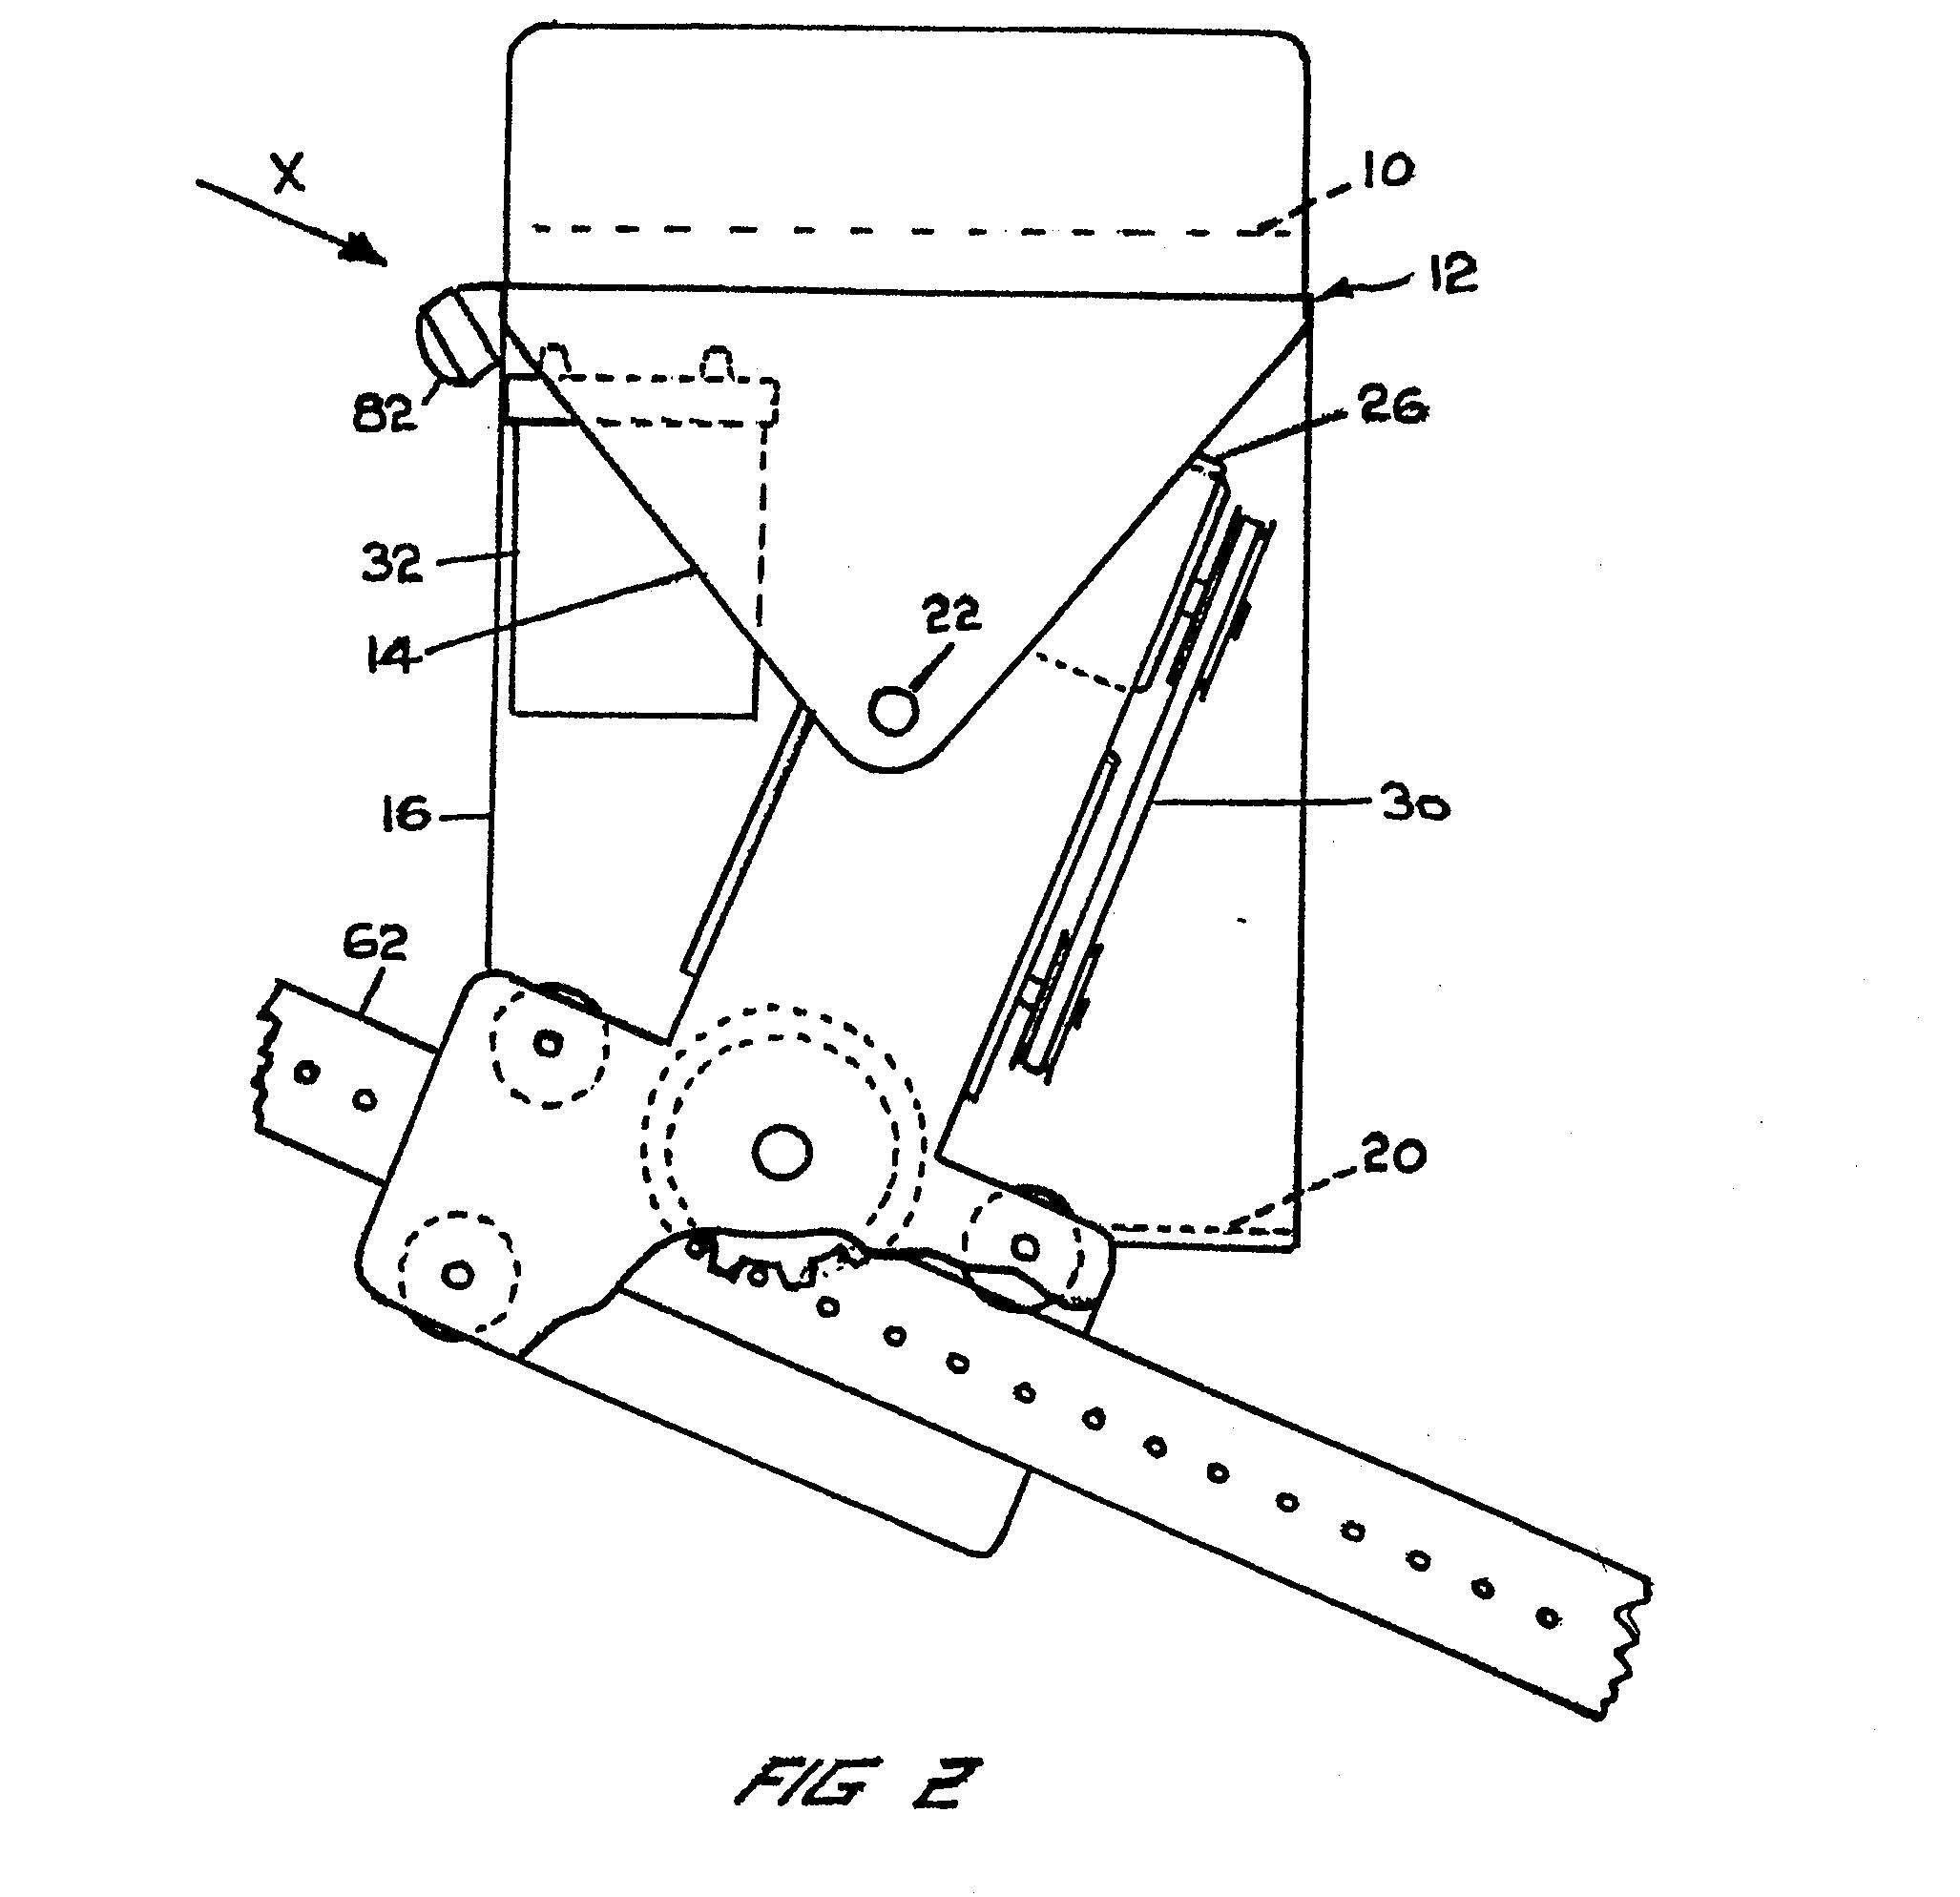 acorn stair lift parts diagram stair anatomy diagram